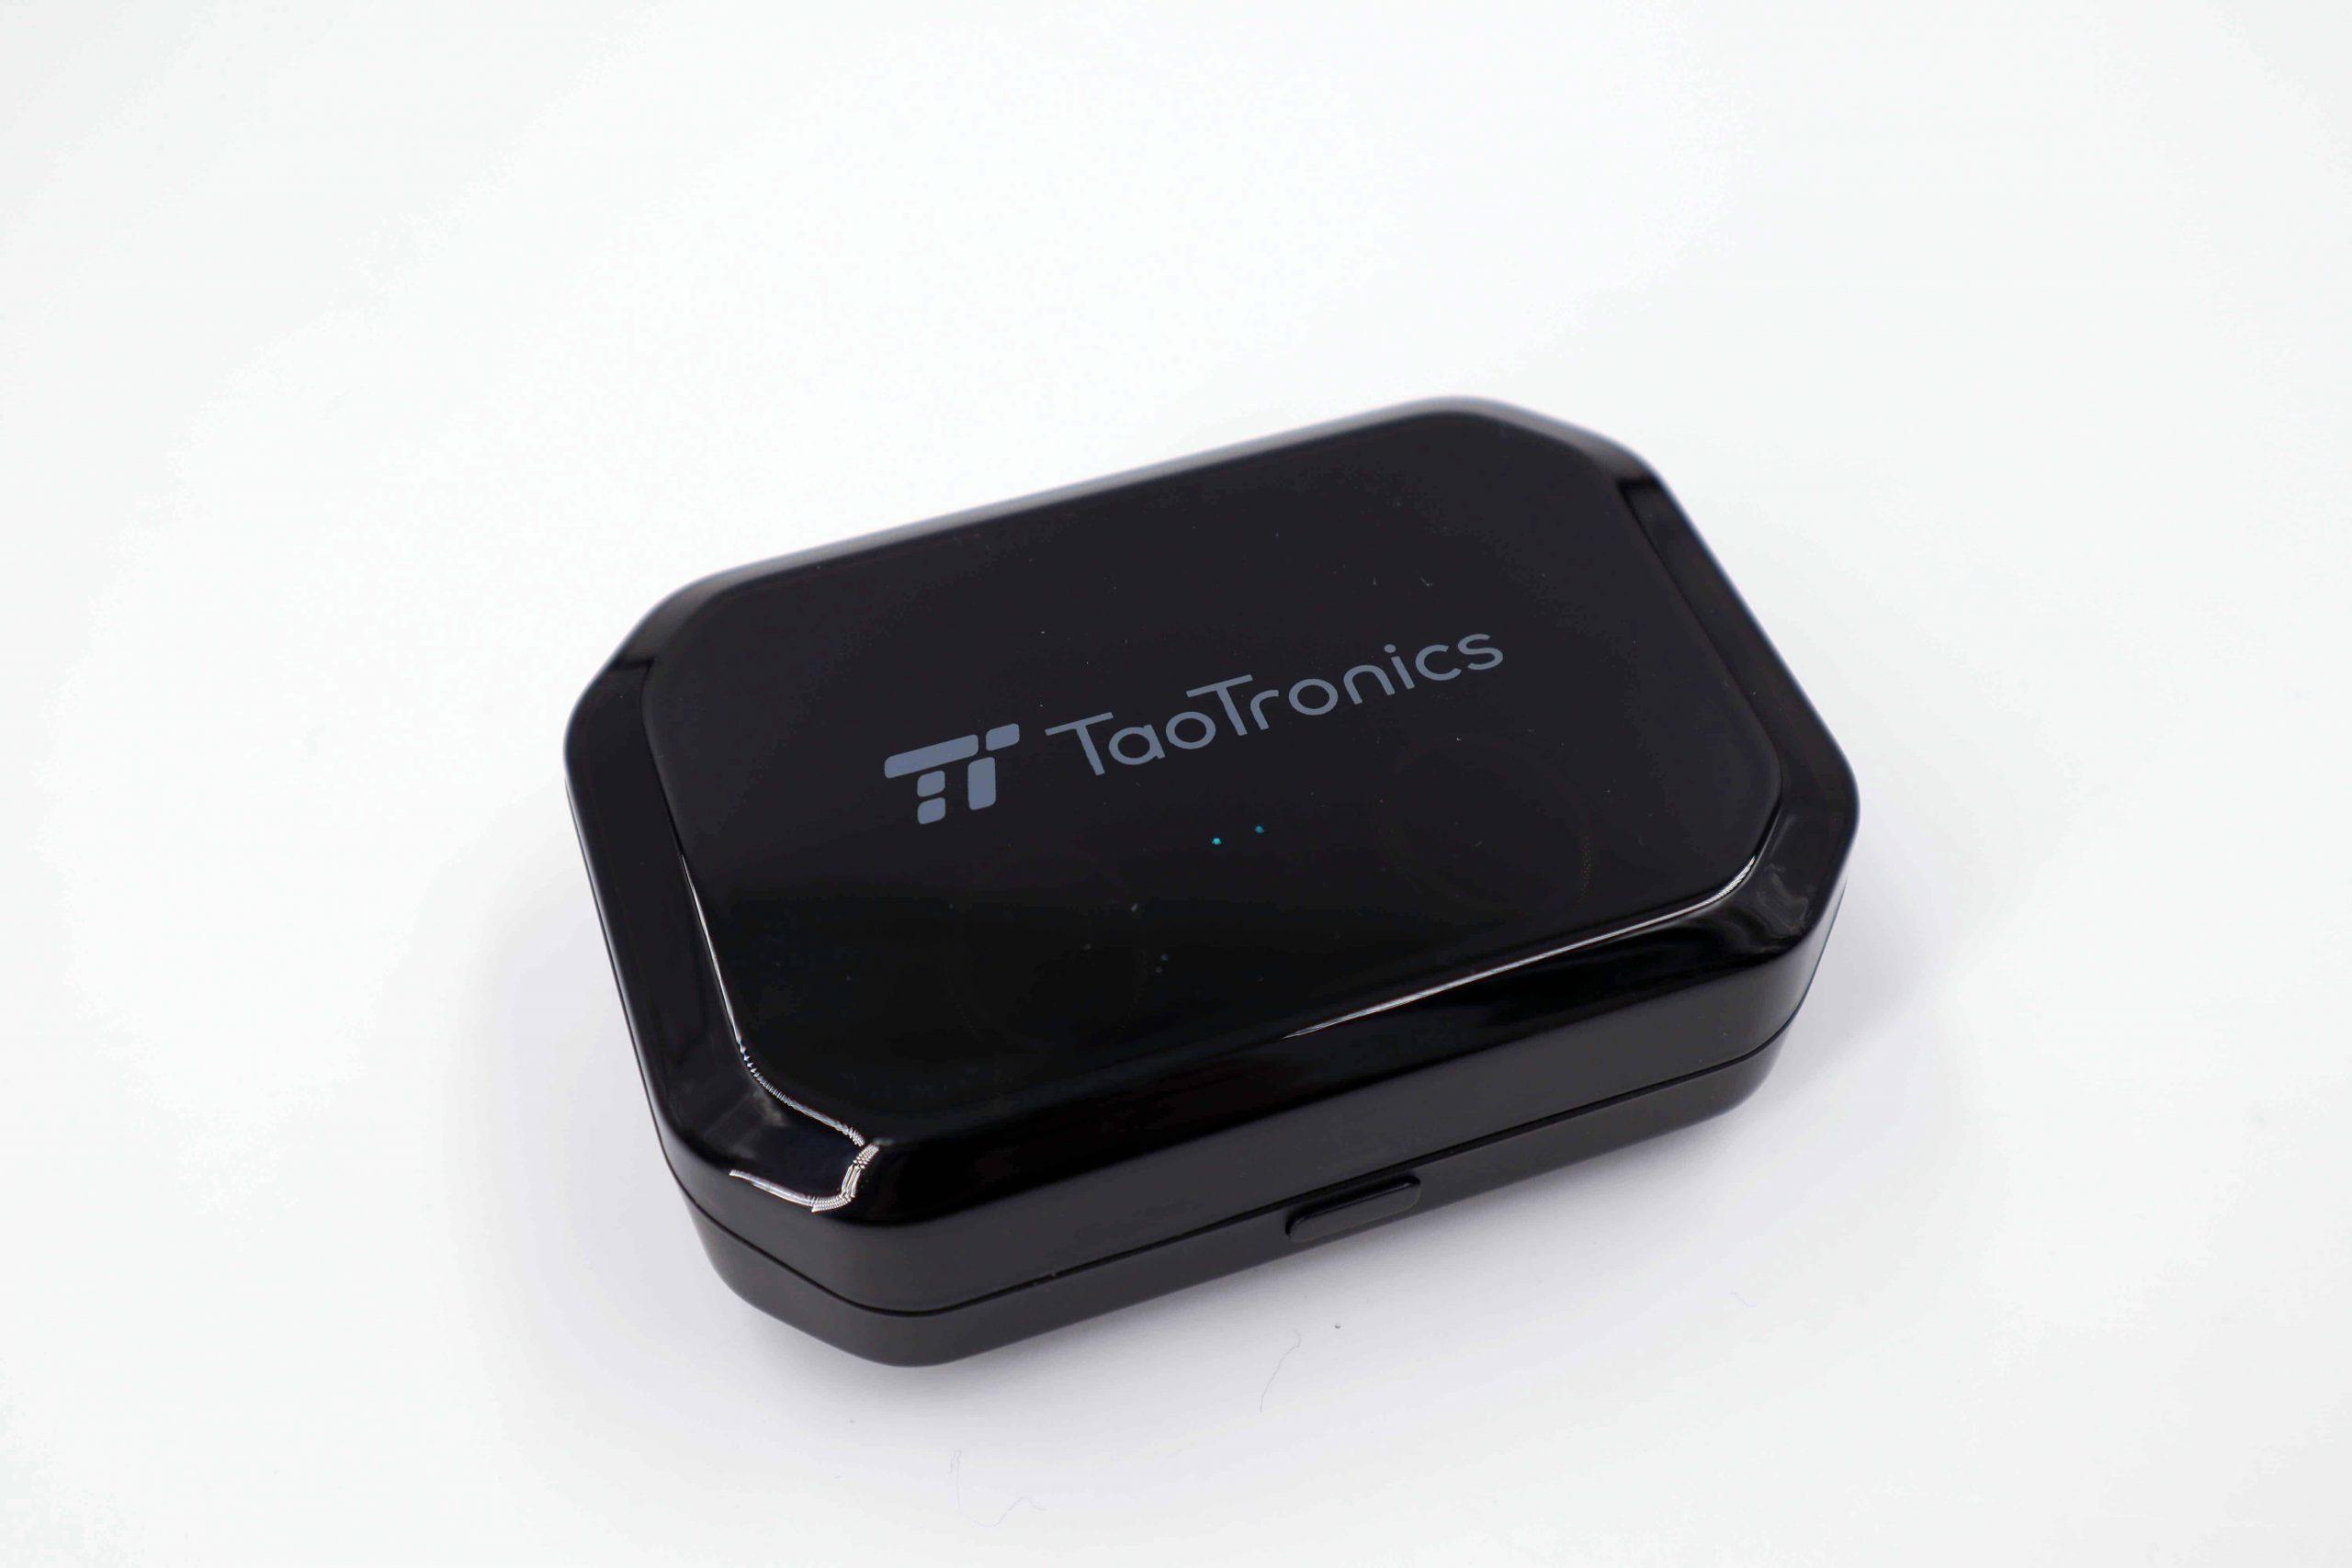 PTT等論壇討論度最熱烈真無線藍牙耳機2000元之選!TaoTronics vs. JLab-TechTeller (科技說)